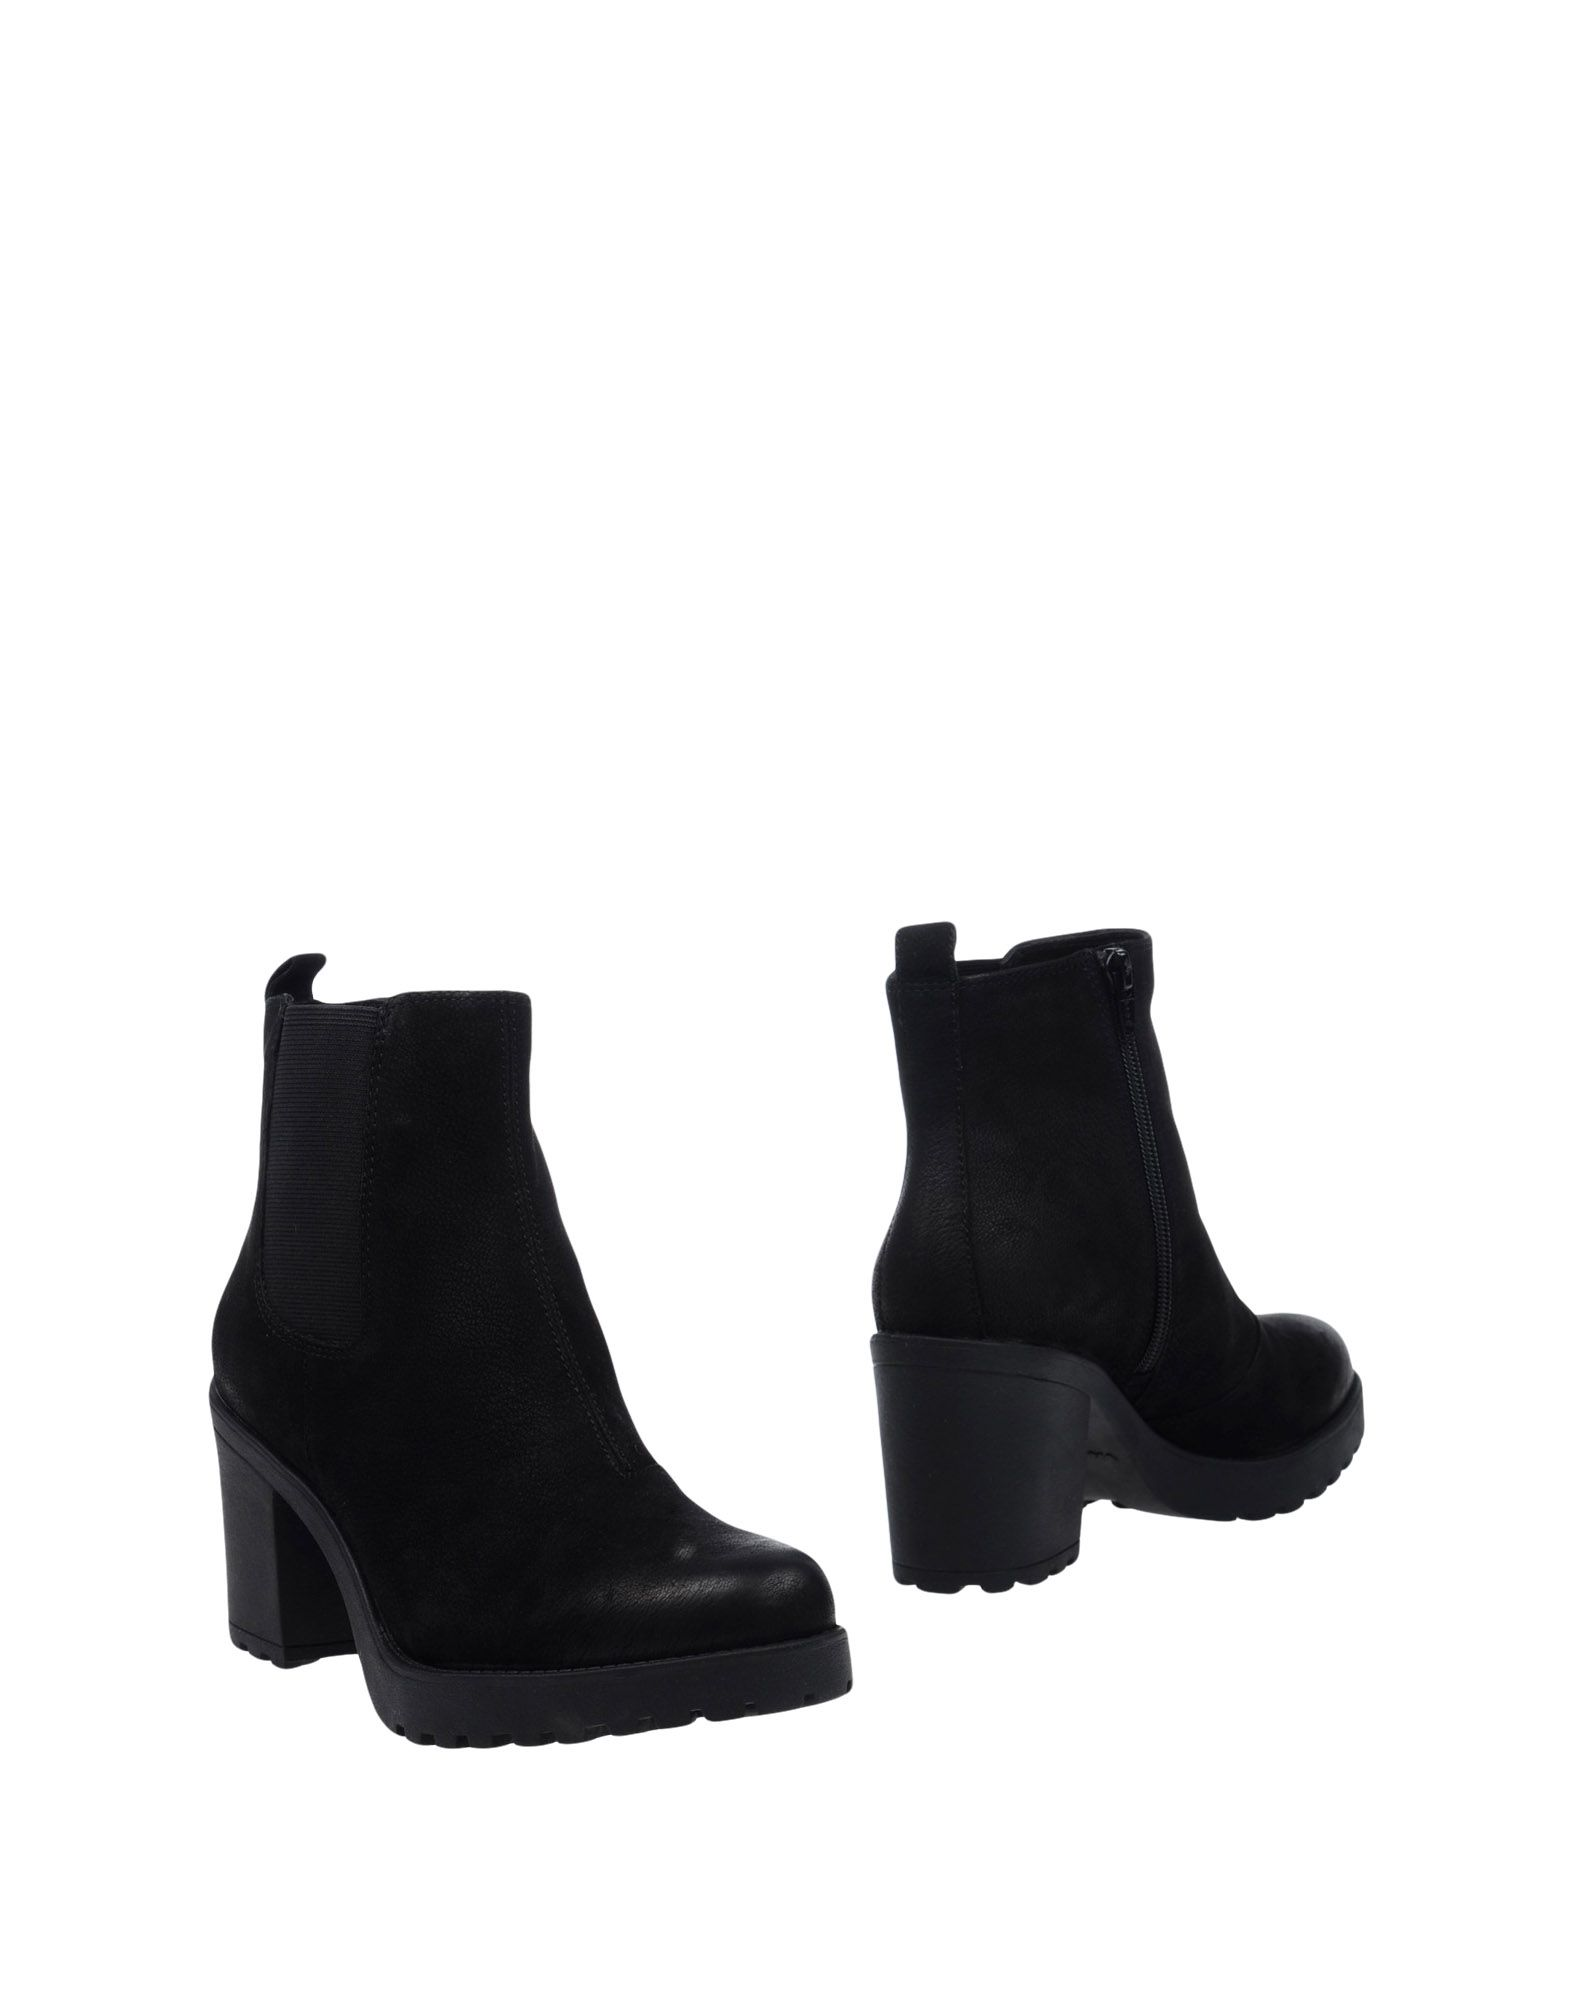 Chelsea Boots 11266344JW Vagabond Shoemakers Donna - 11266344JW Boots 1a5706